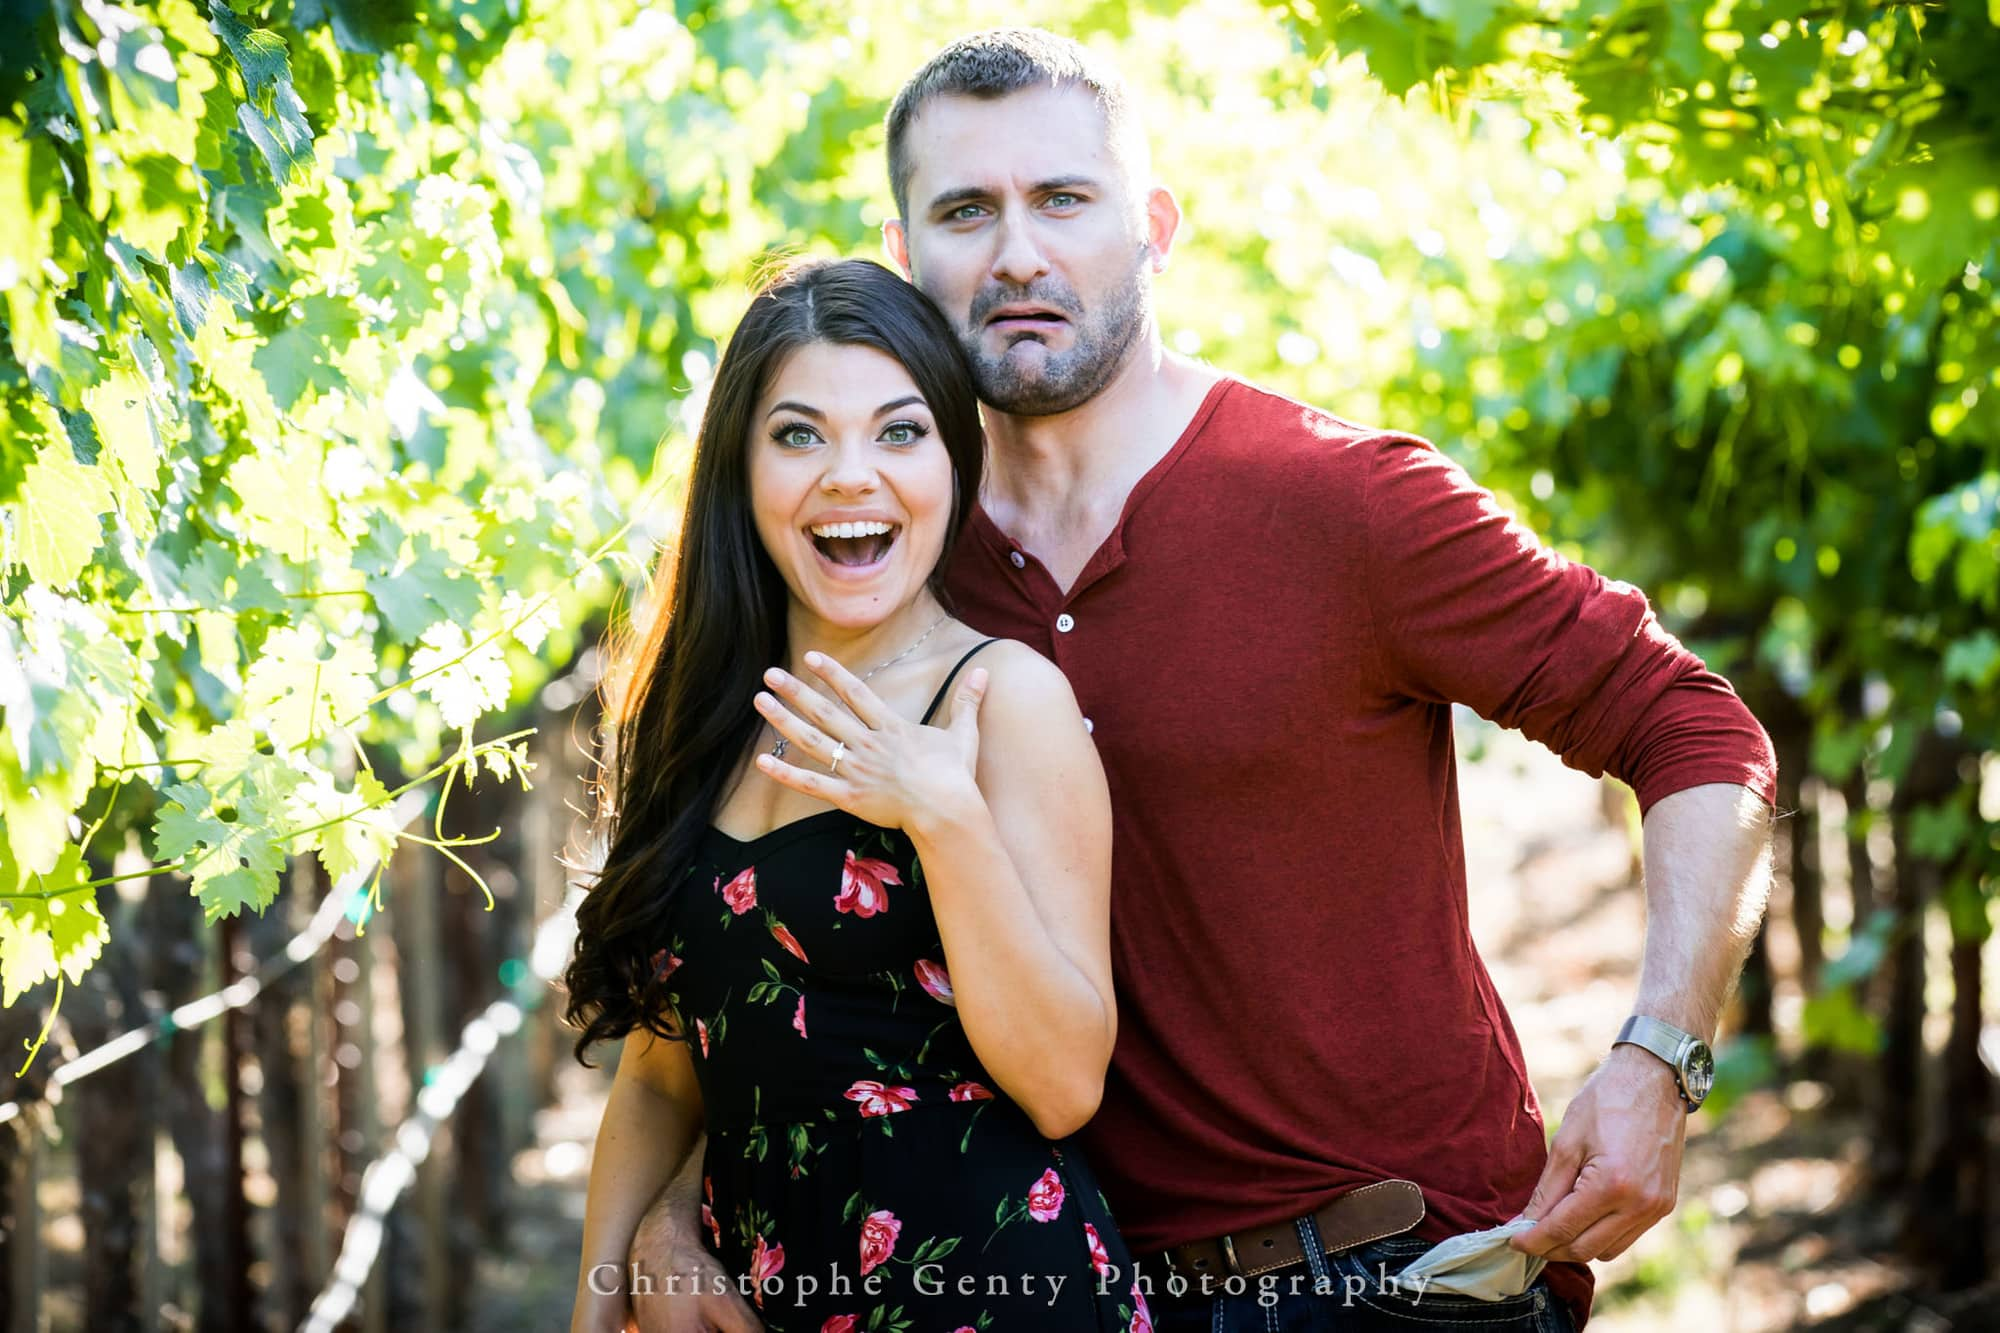 Castello di Amorosa Marriage Proposal Photography 345